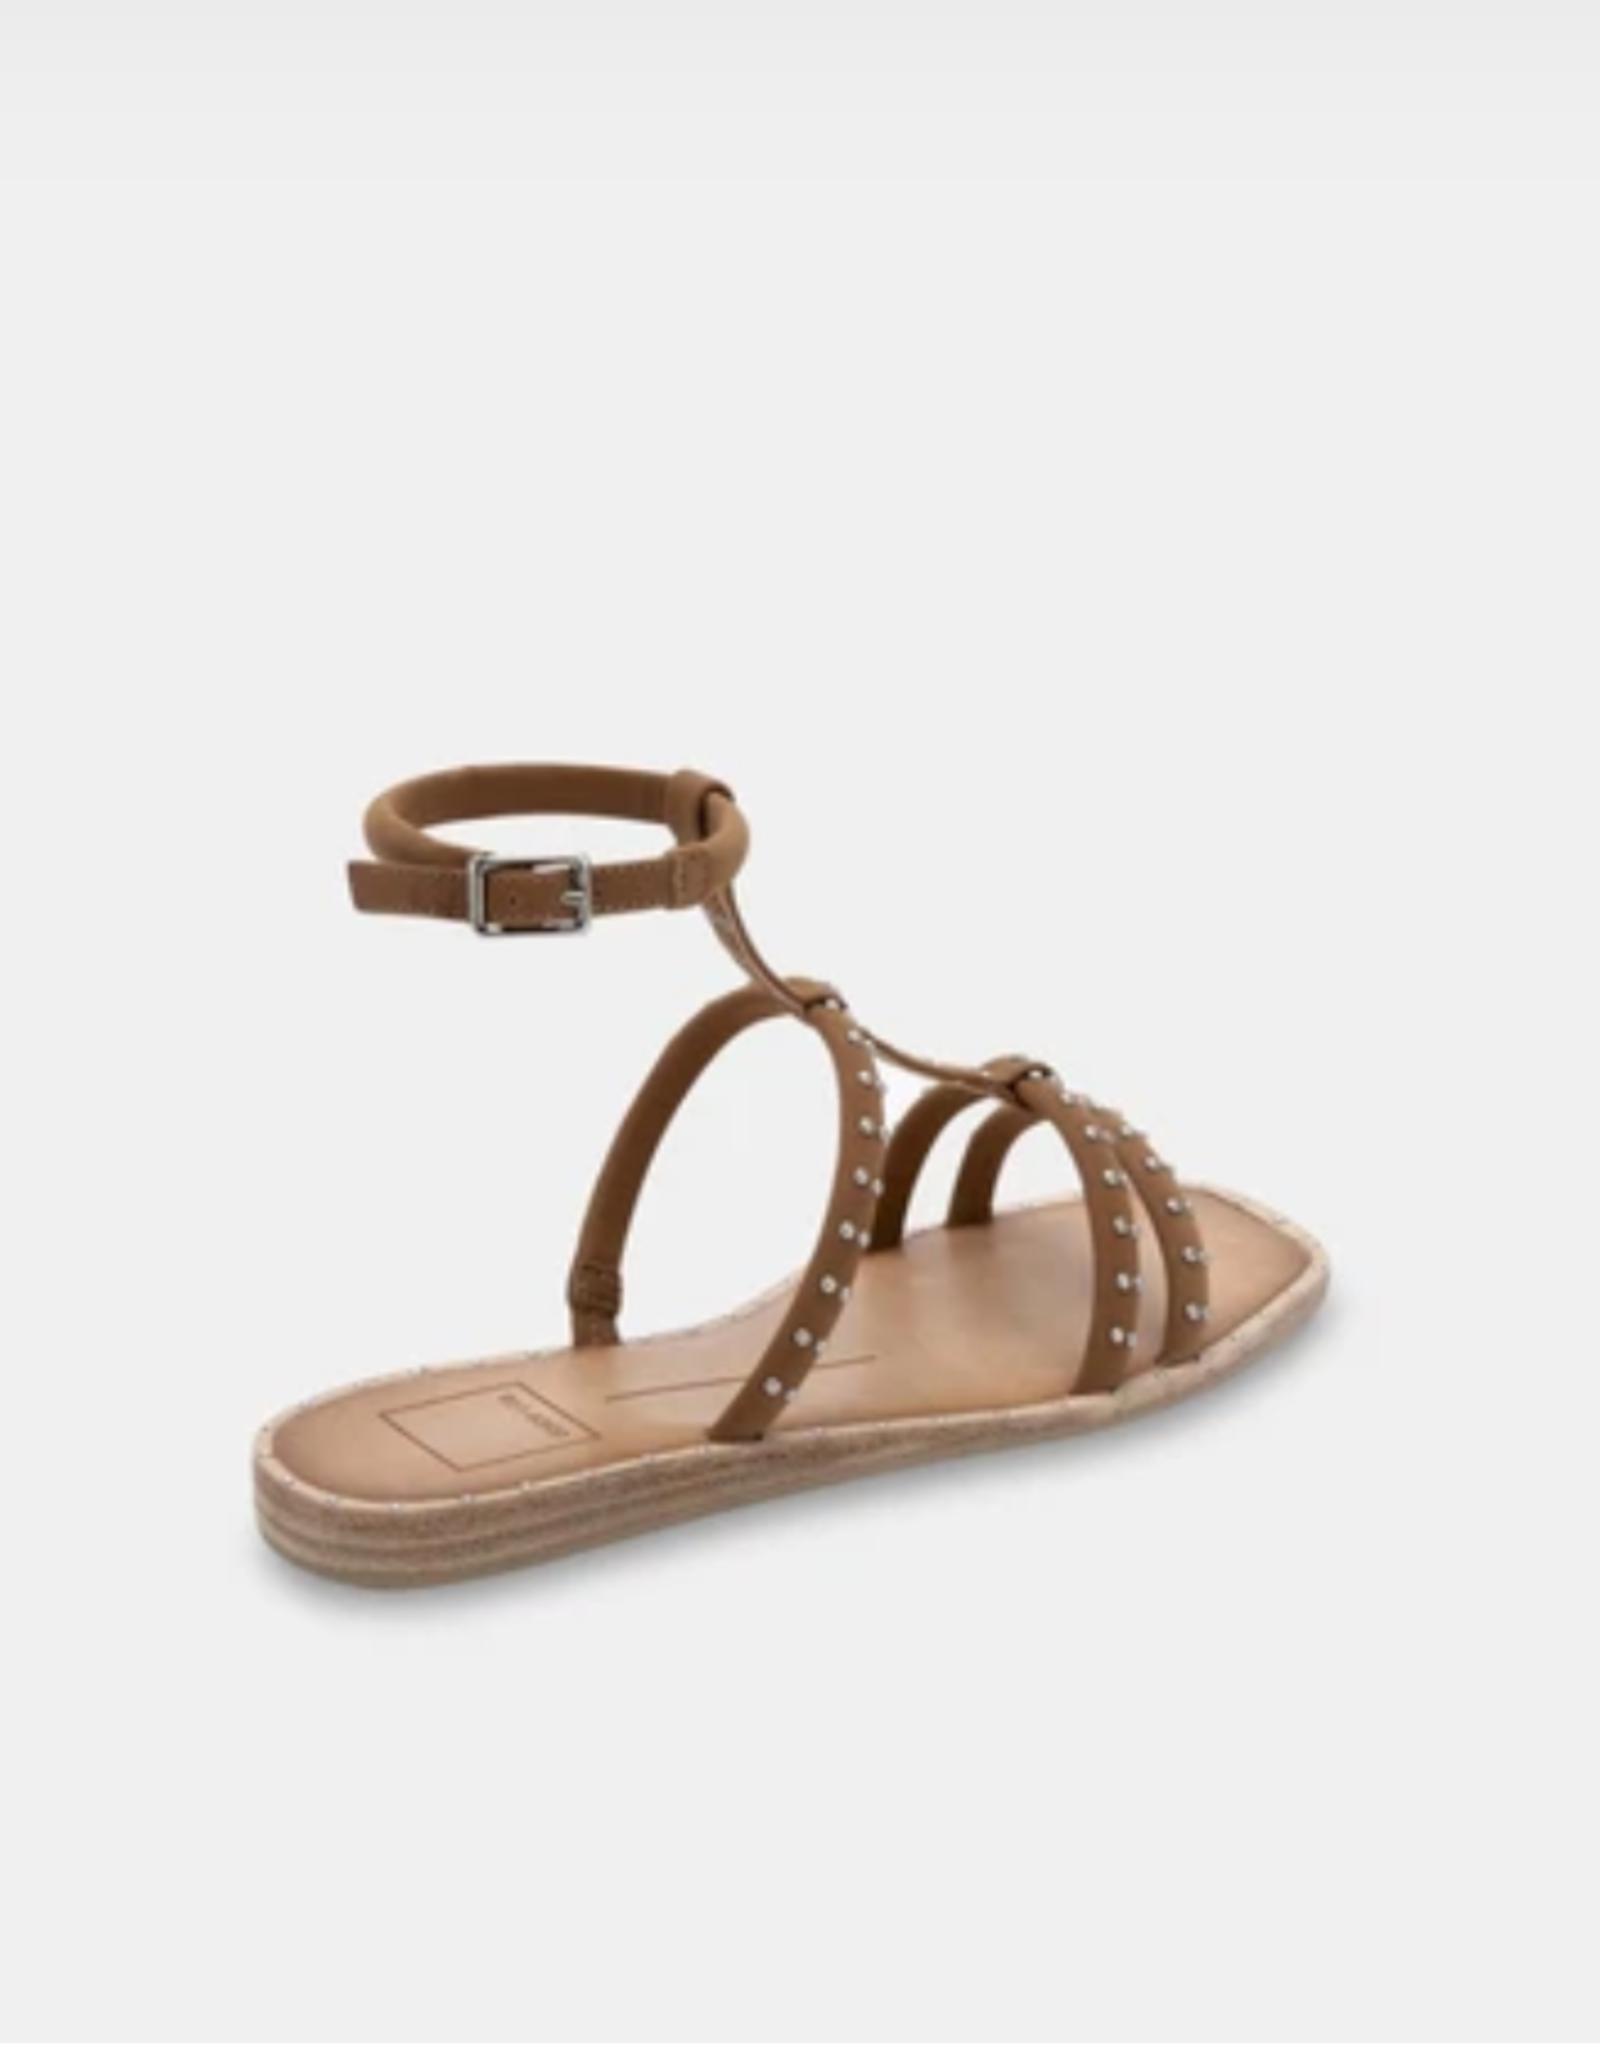 Dolce Vita Kole Sandals